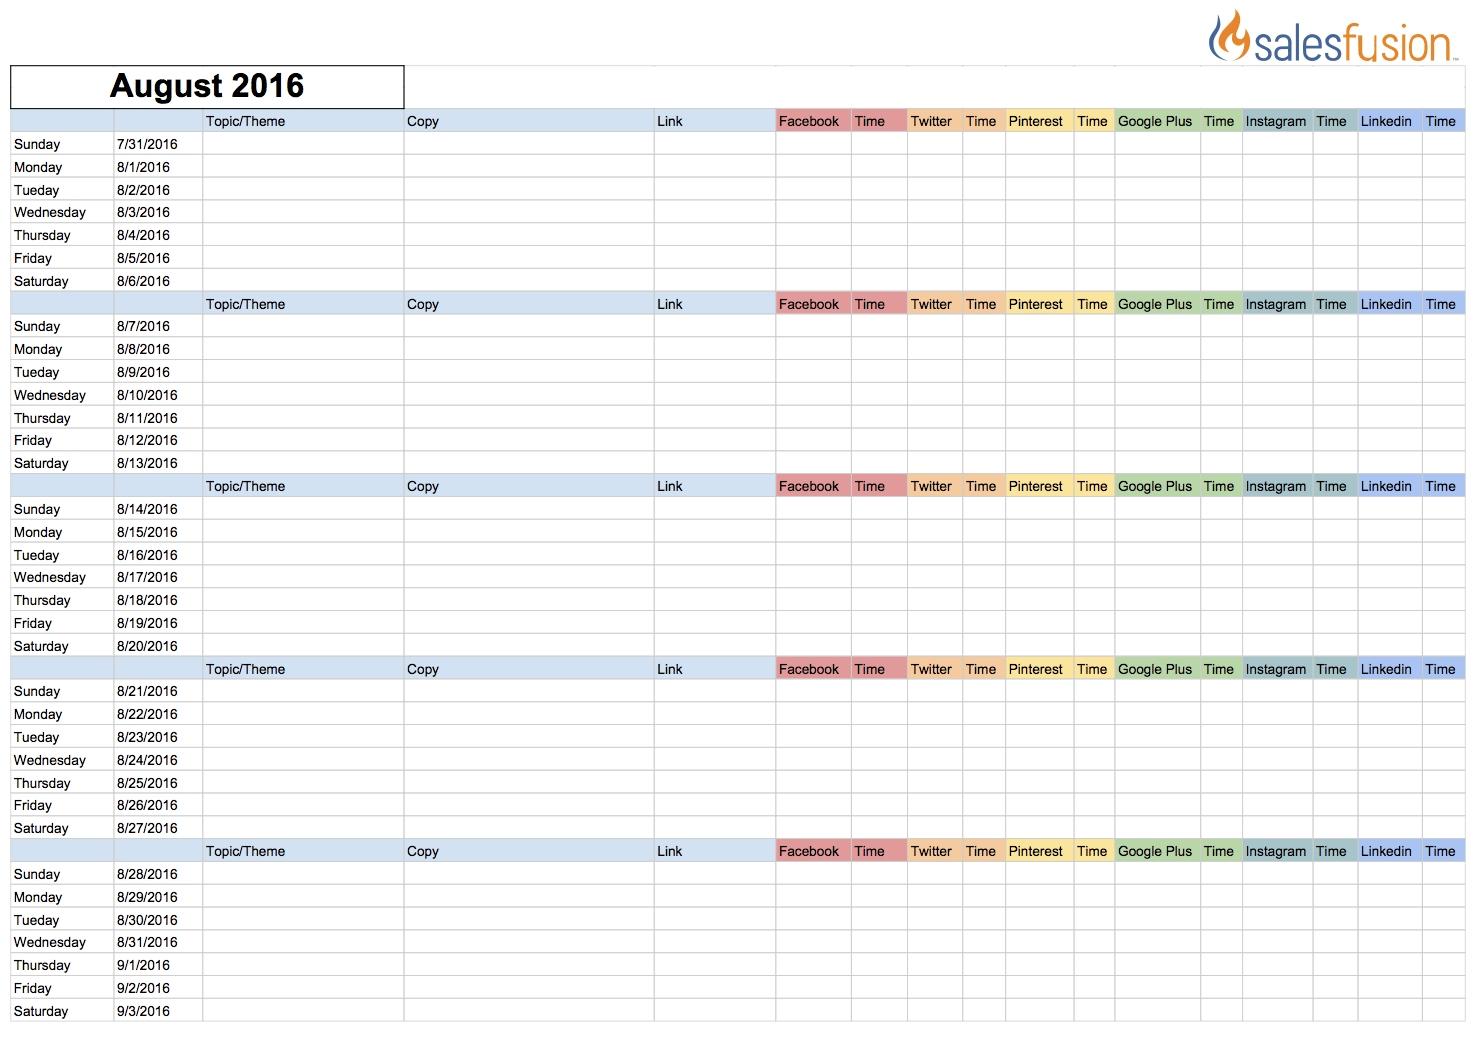 Social Media Content Calendar Template | Salesfusion with Social Media Content Weekly Schedule